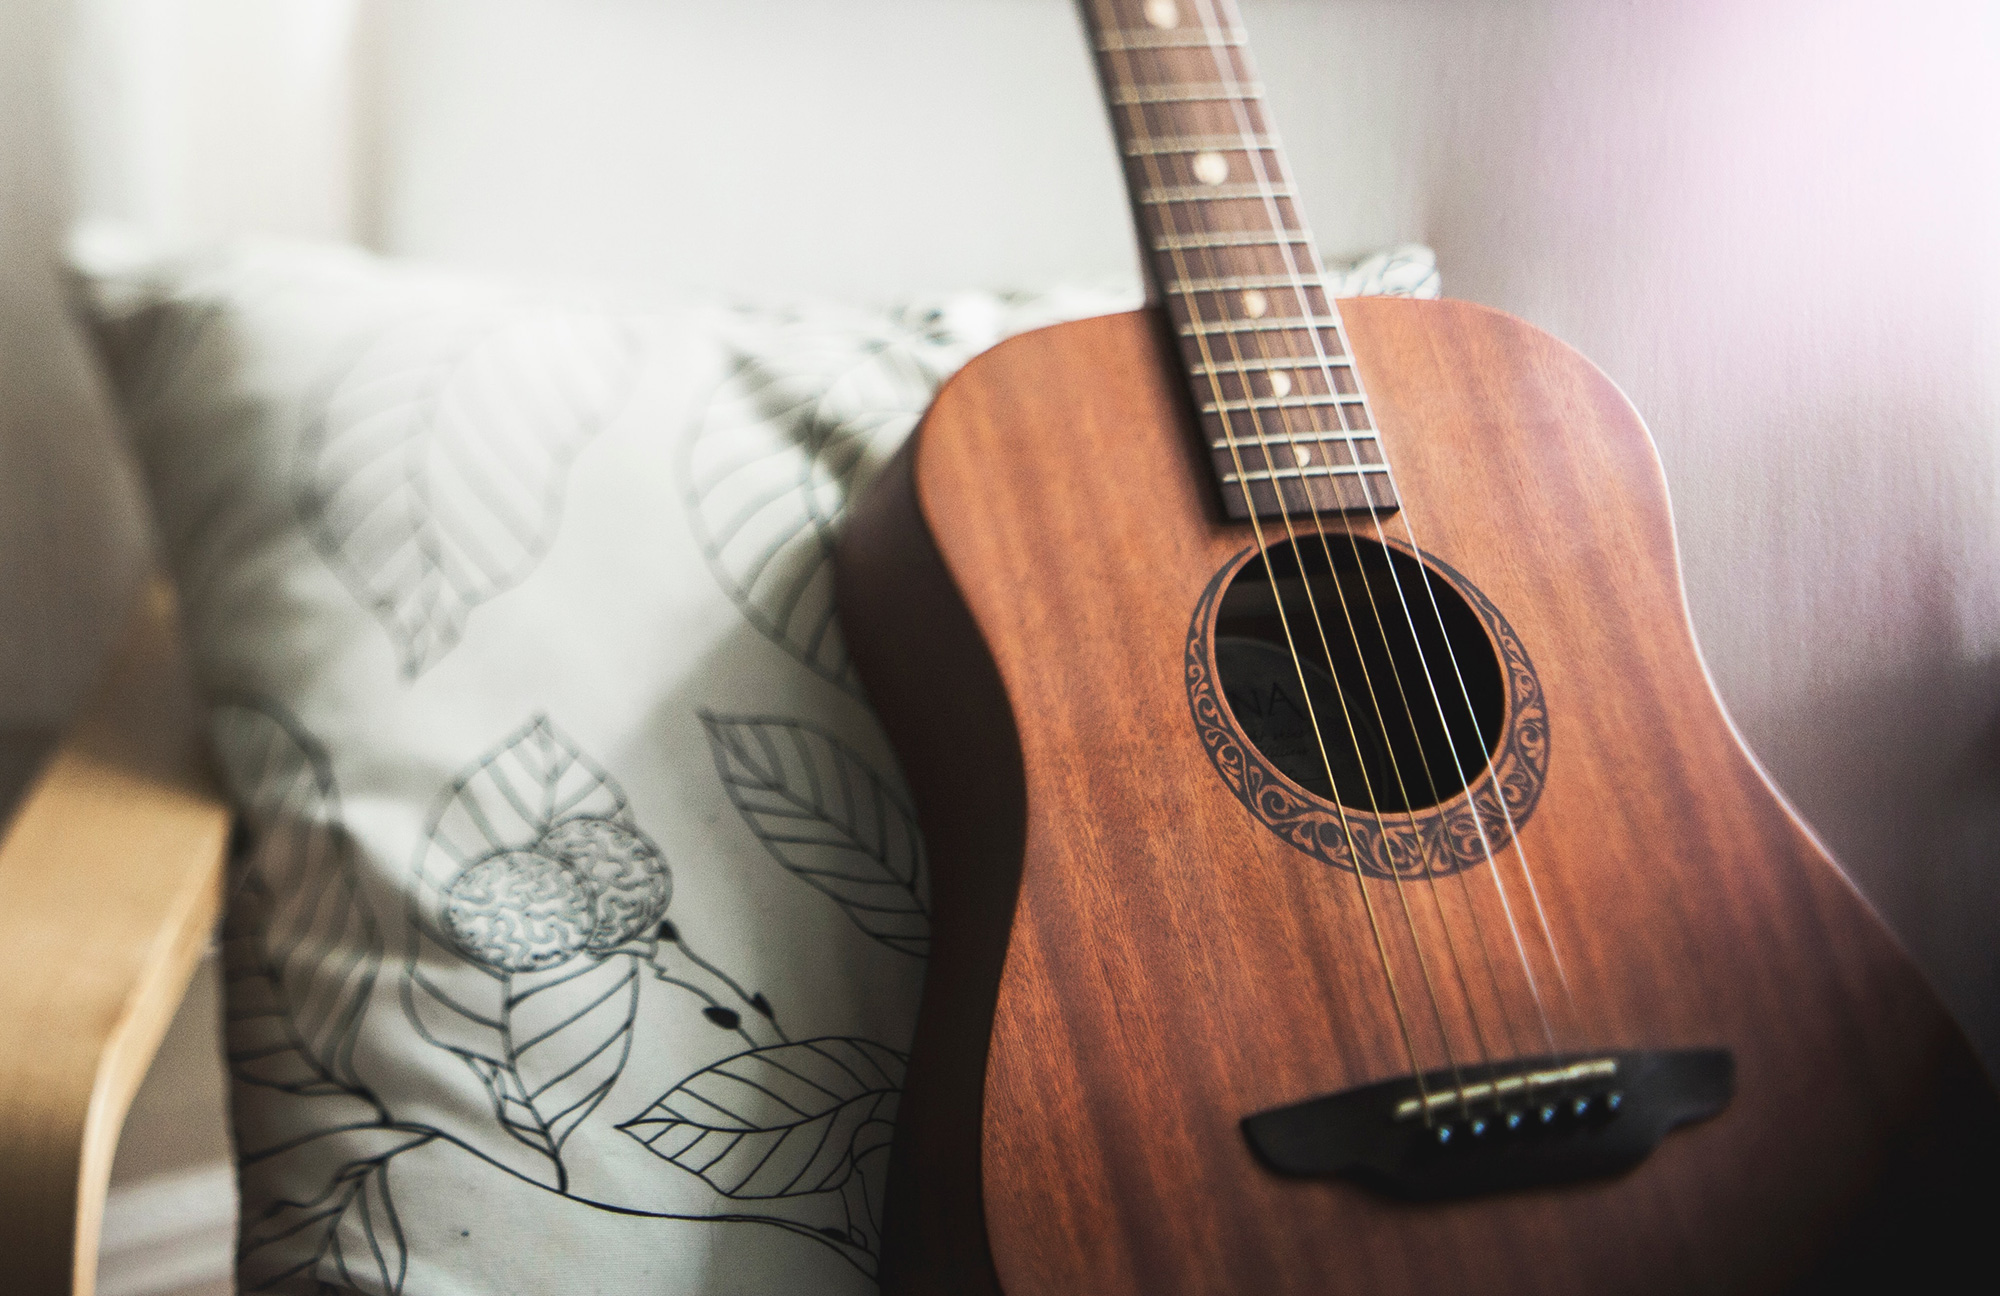 Bild: Musiktherapie Gitarre